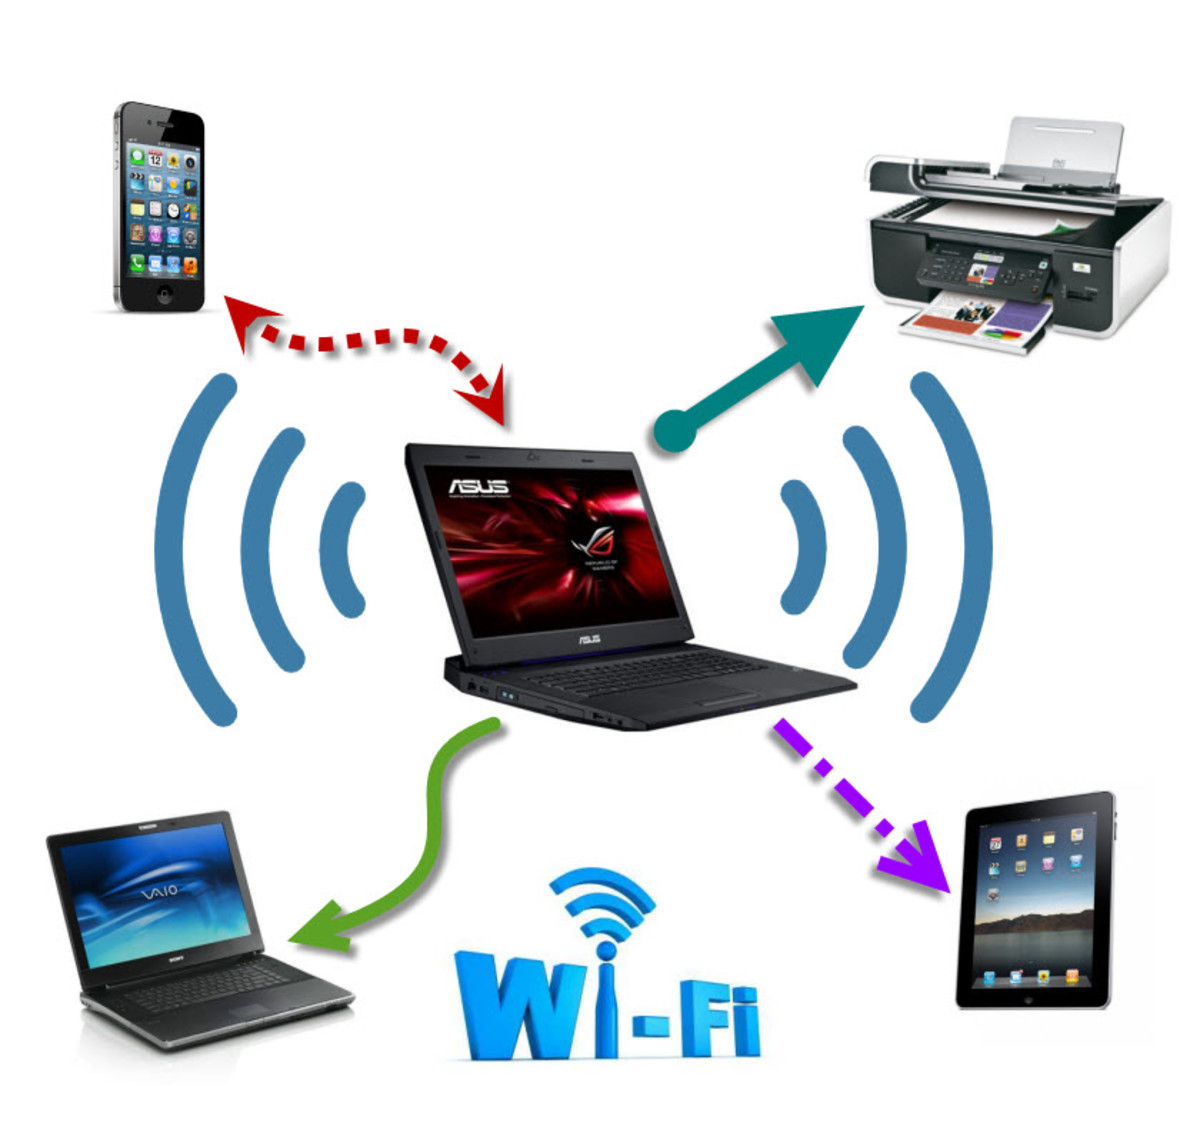 1 компьютер ноутбук wi fi роутер сеть